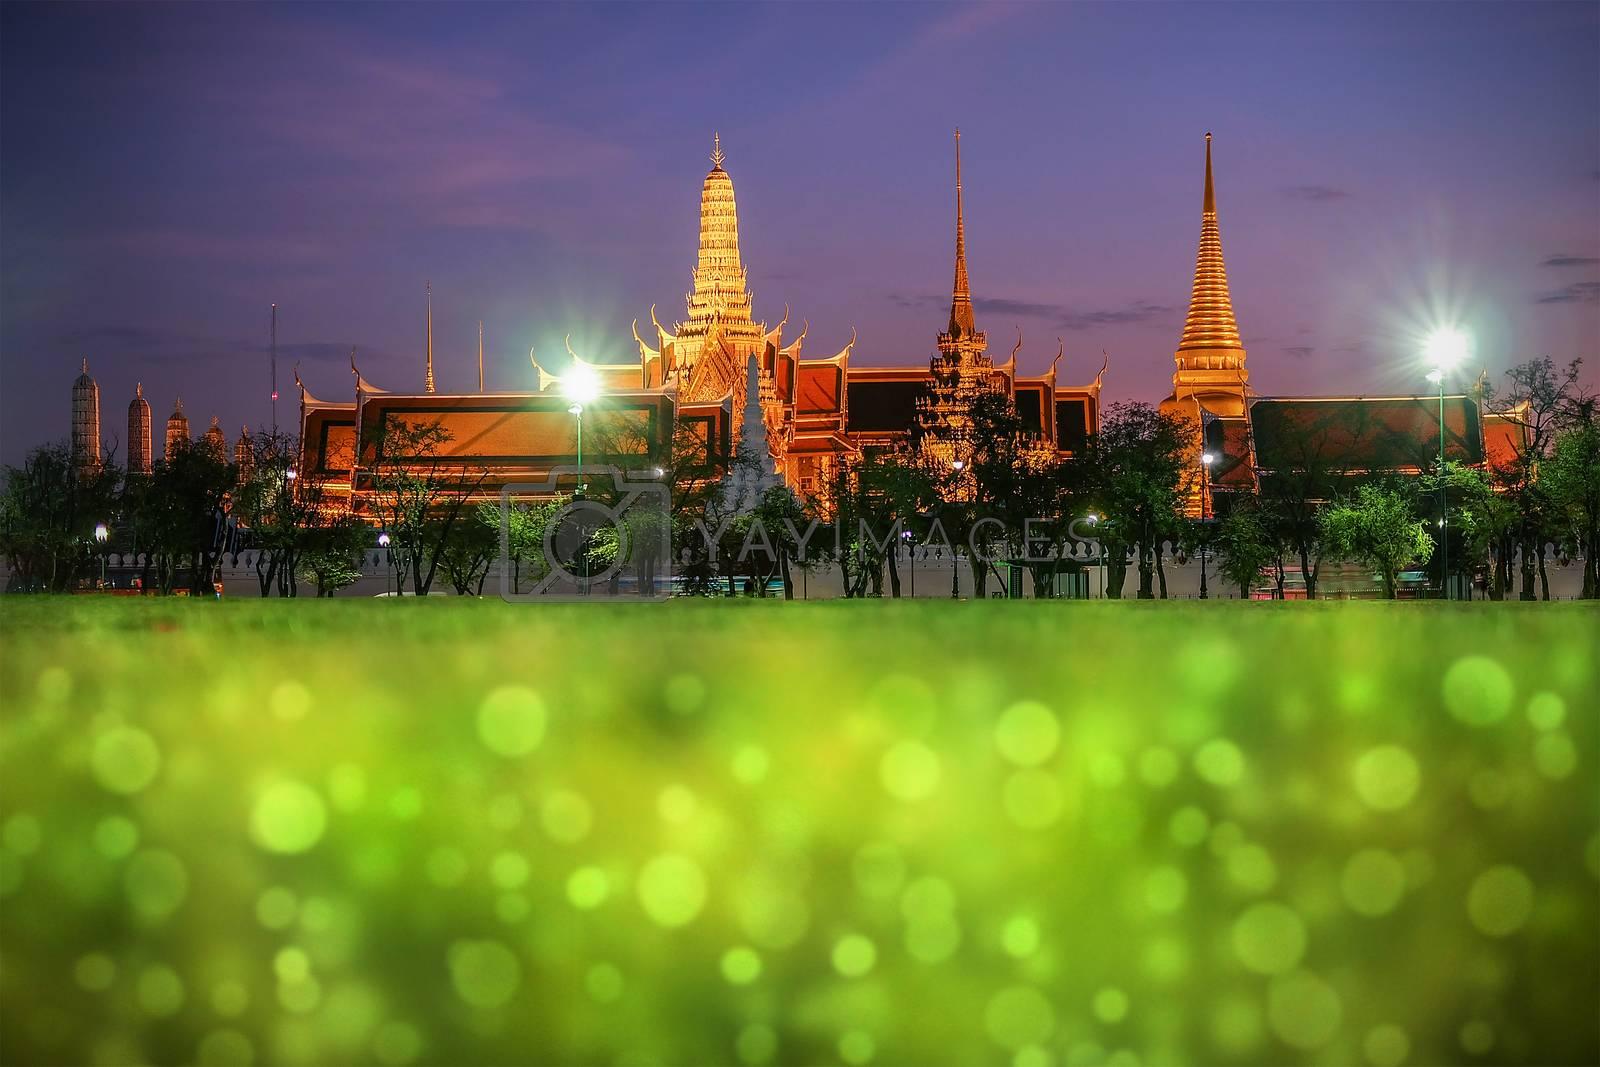 Wat Phra Kaew (The Emerald Buddha) night view in Thailand